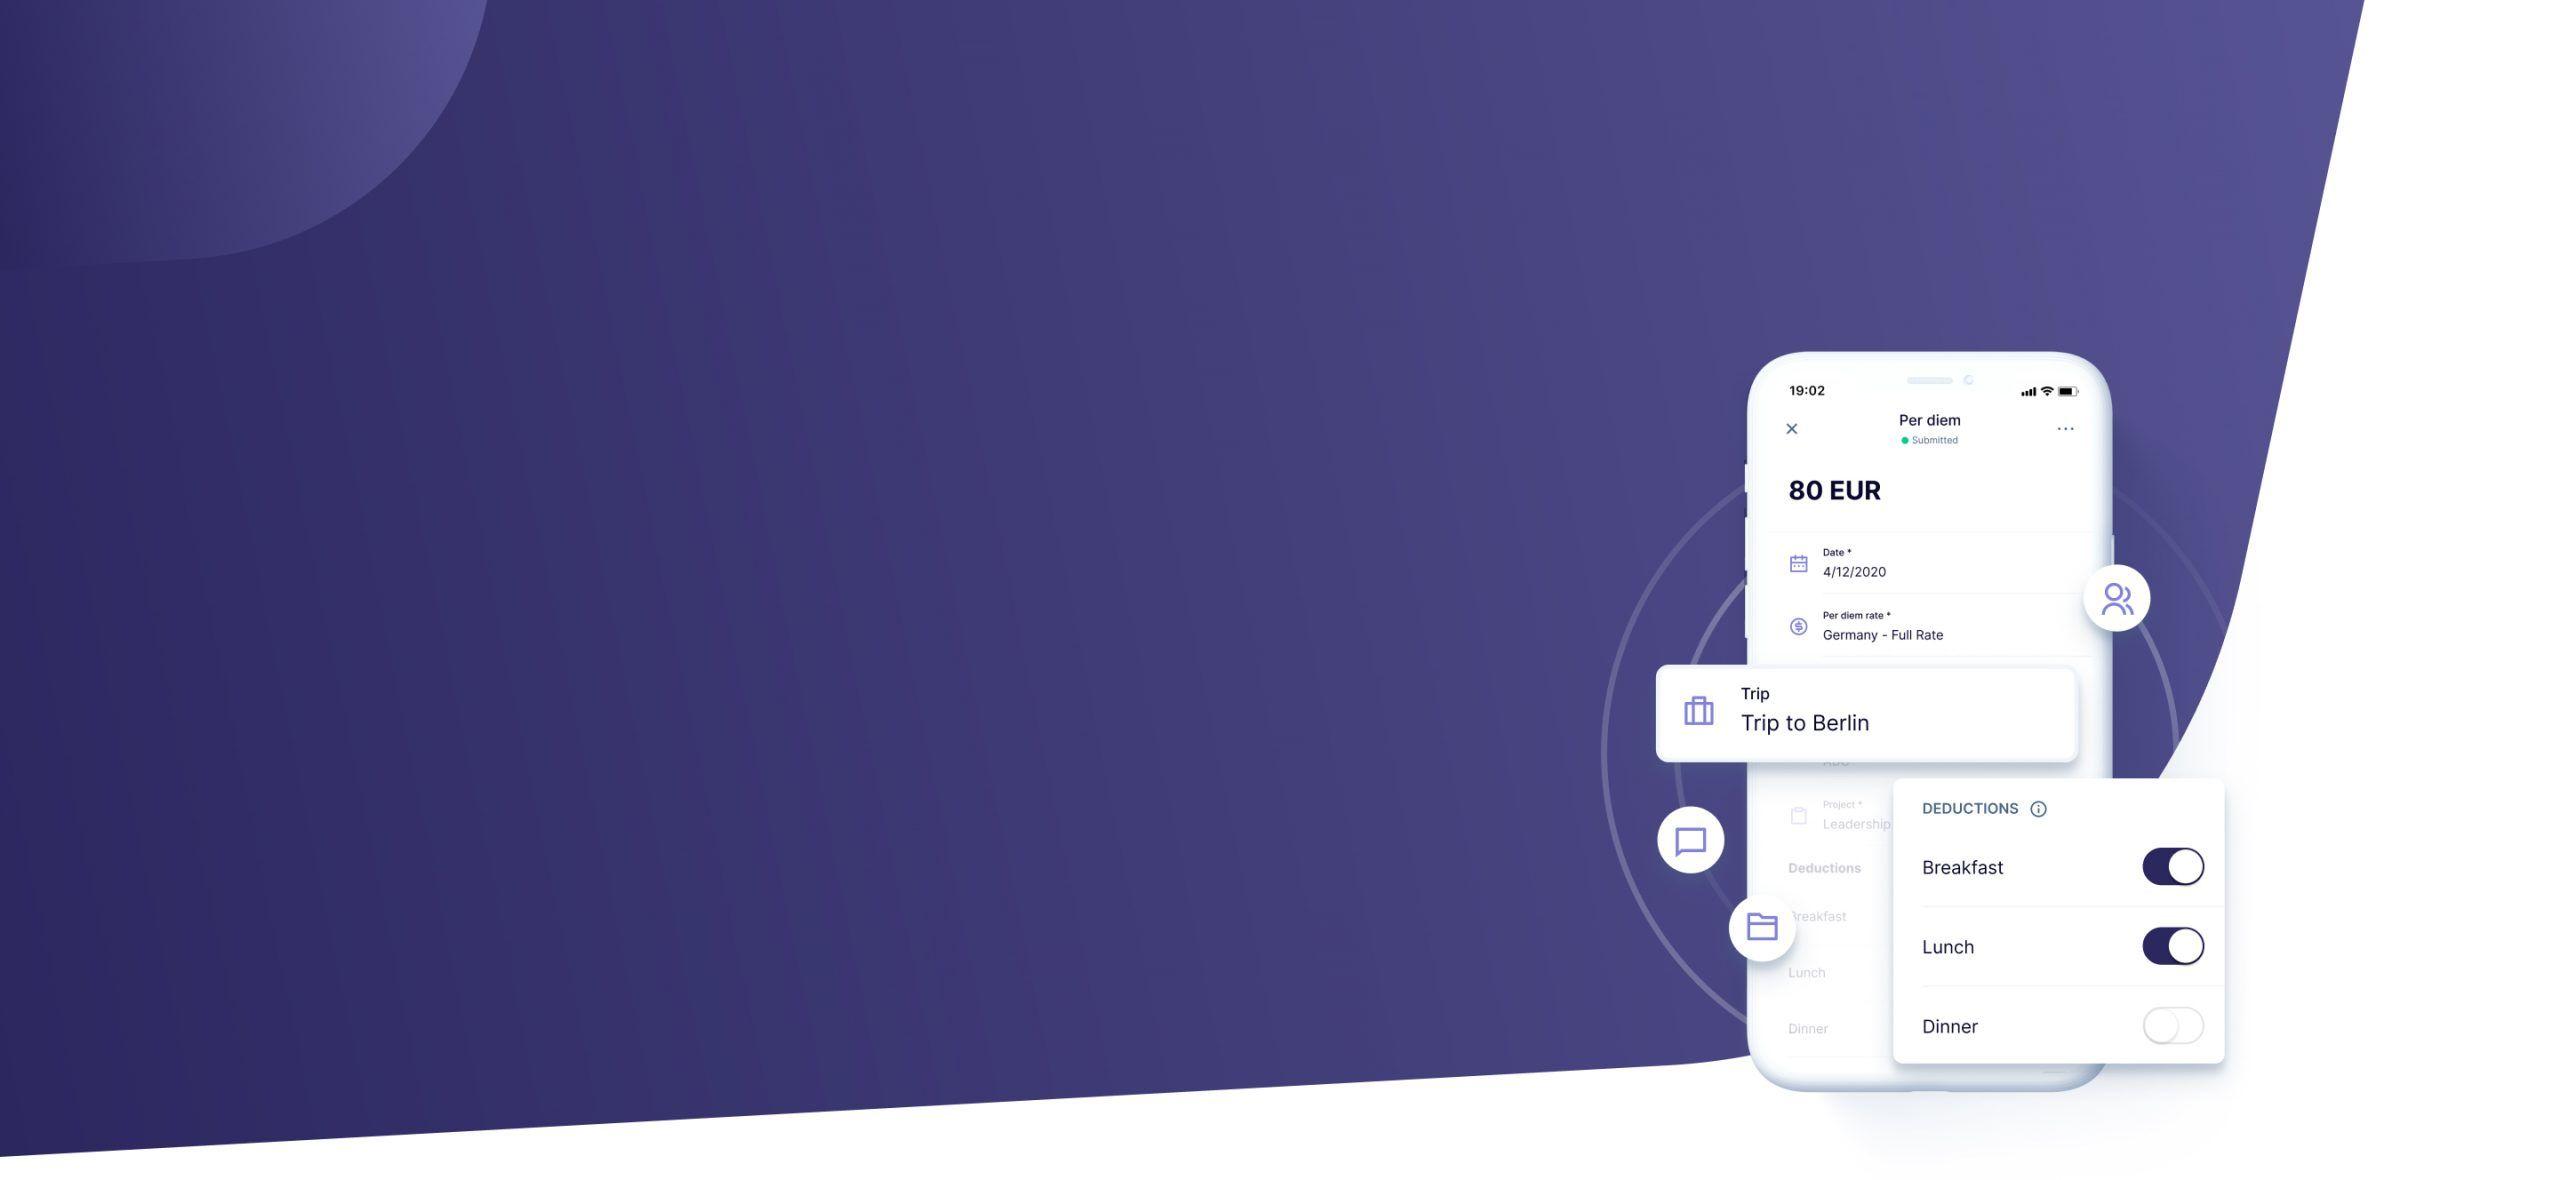 Per Diems on the smartphone app